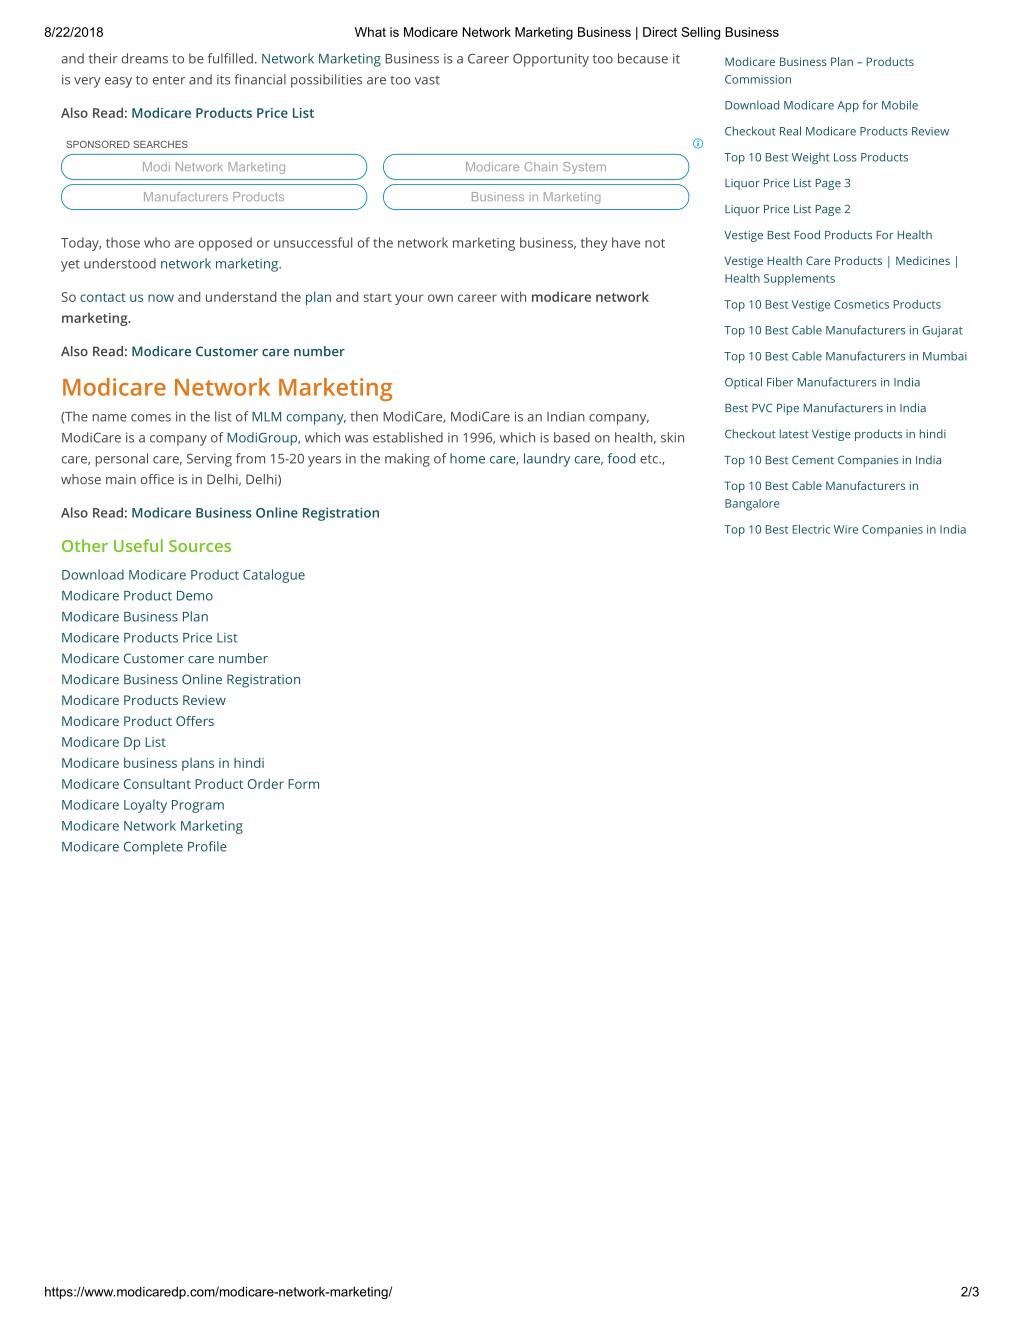 PPT - modicare network marketing PowerPoint Presentation